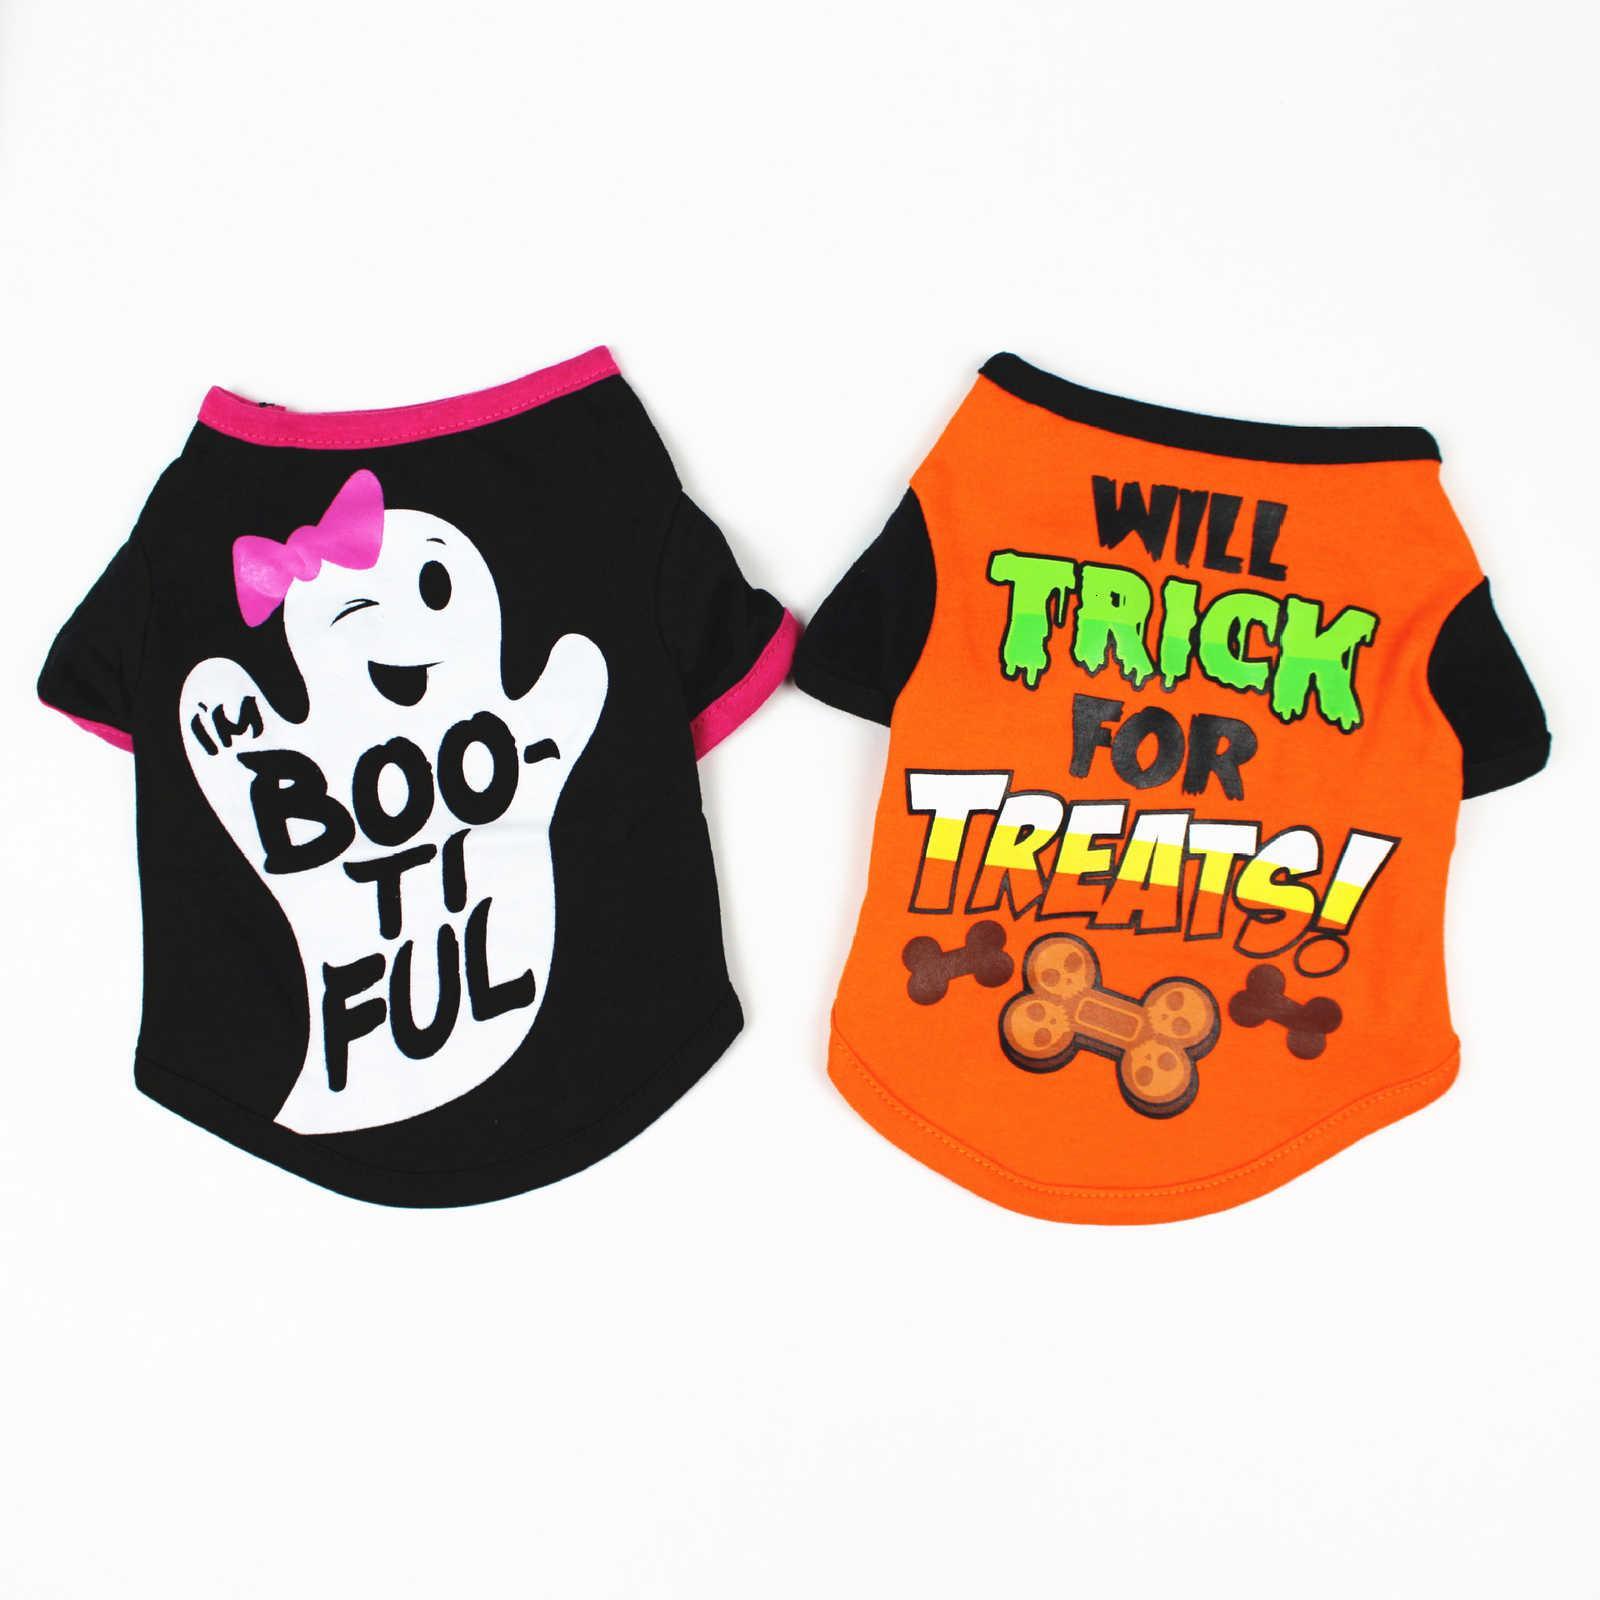 Dog Spring Summer and Cartoon Print T-shirt Teddy Bear Pet Halloween Clothing